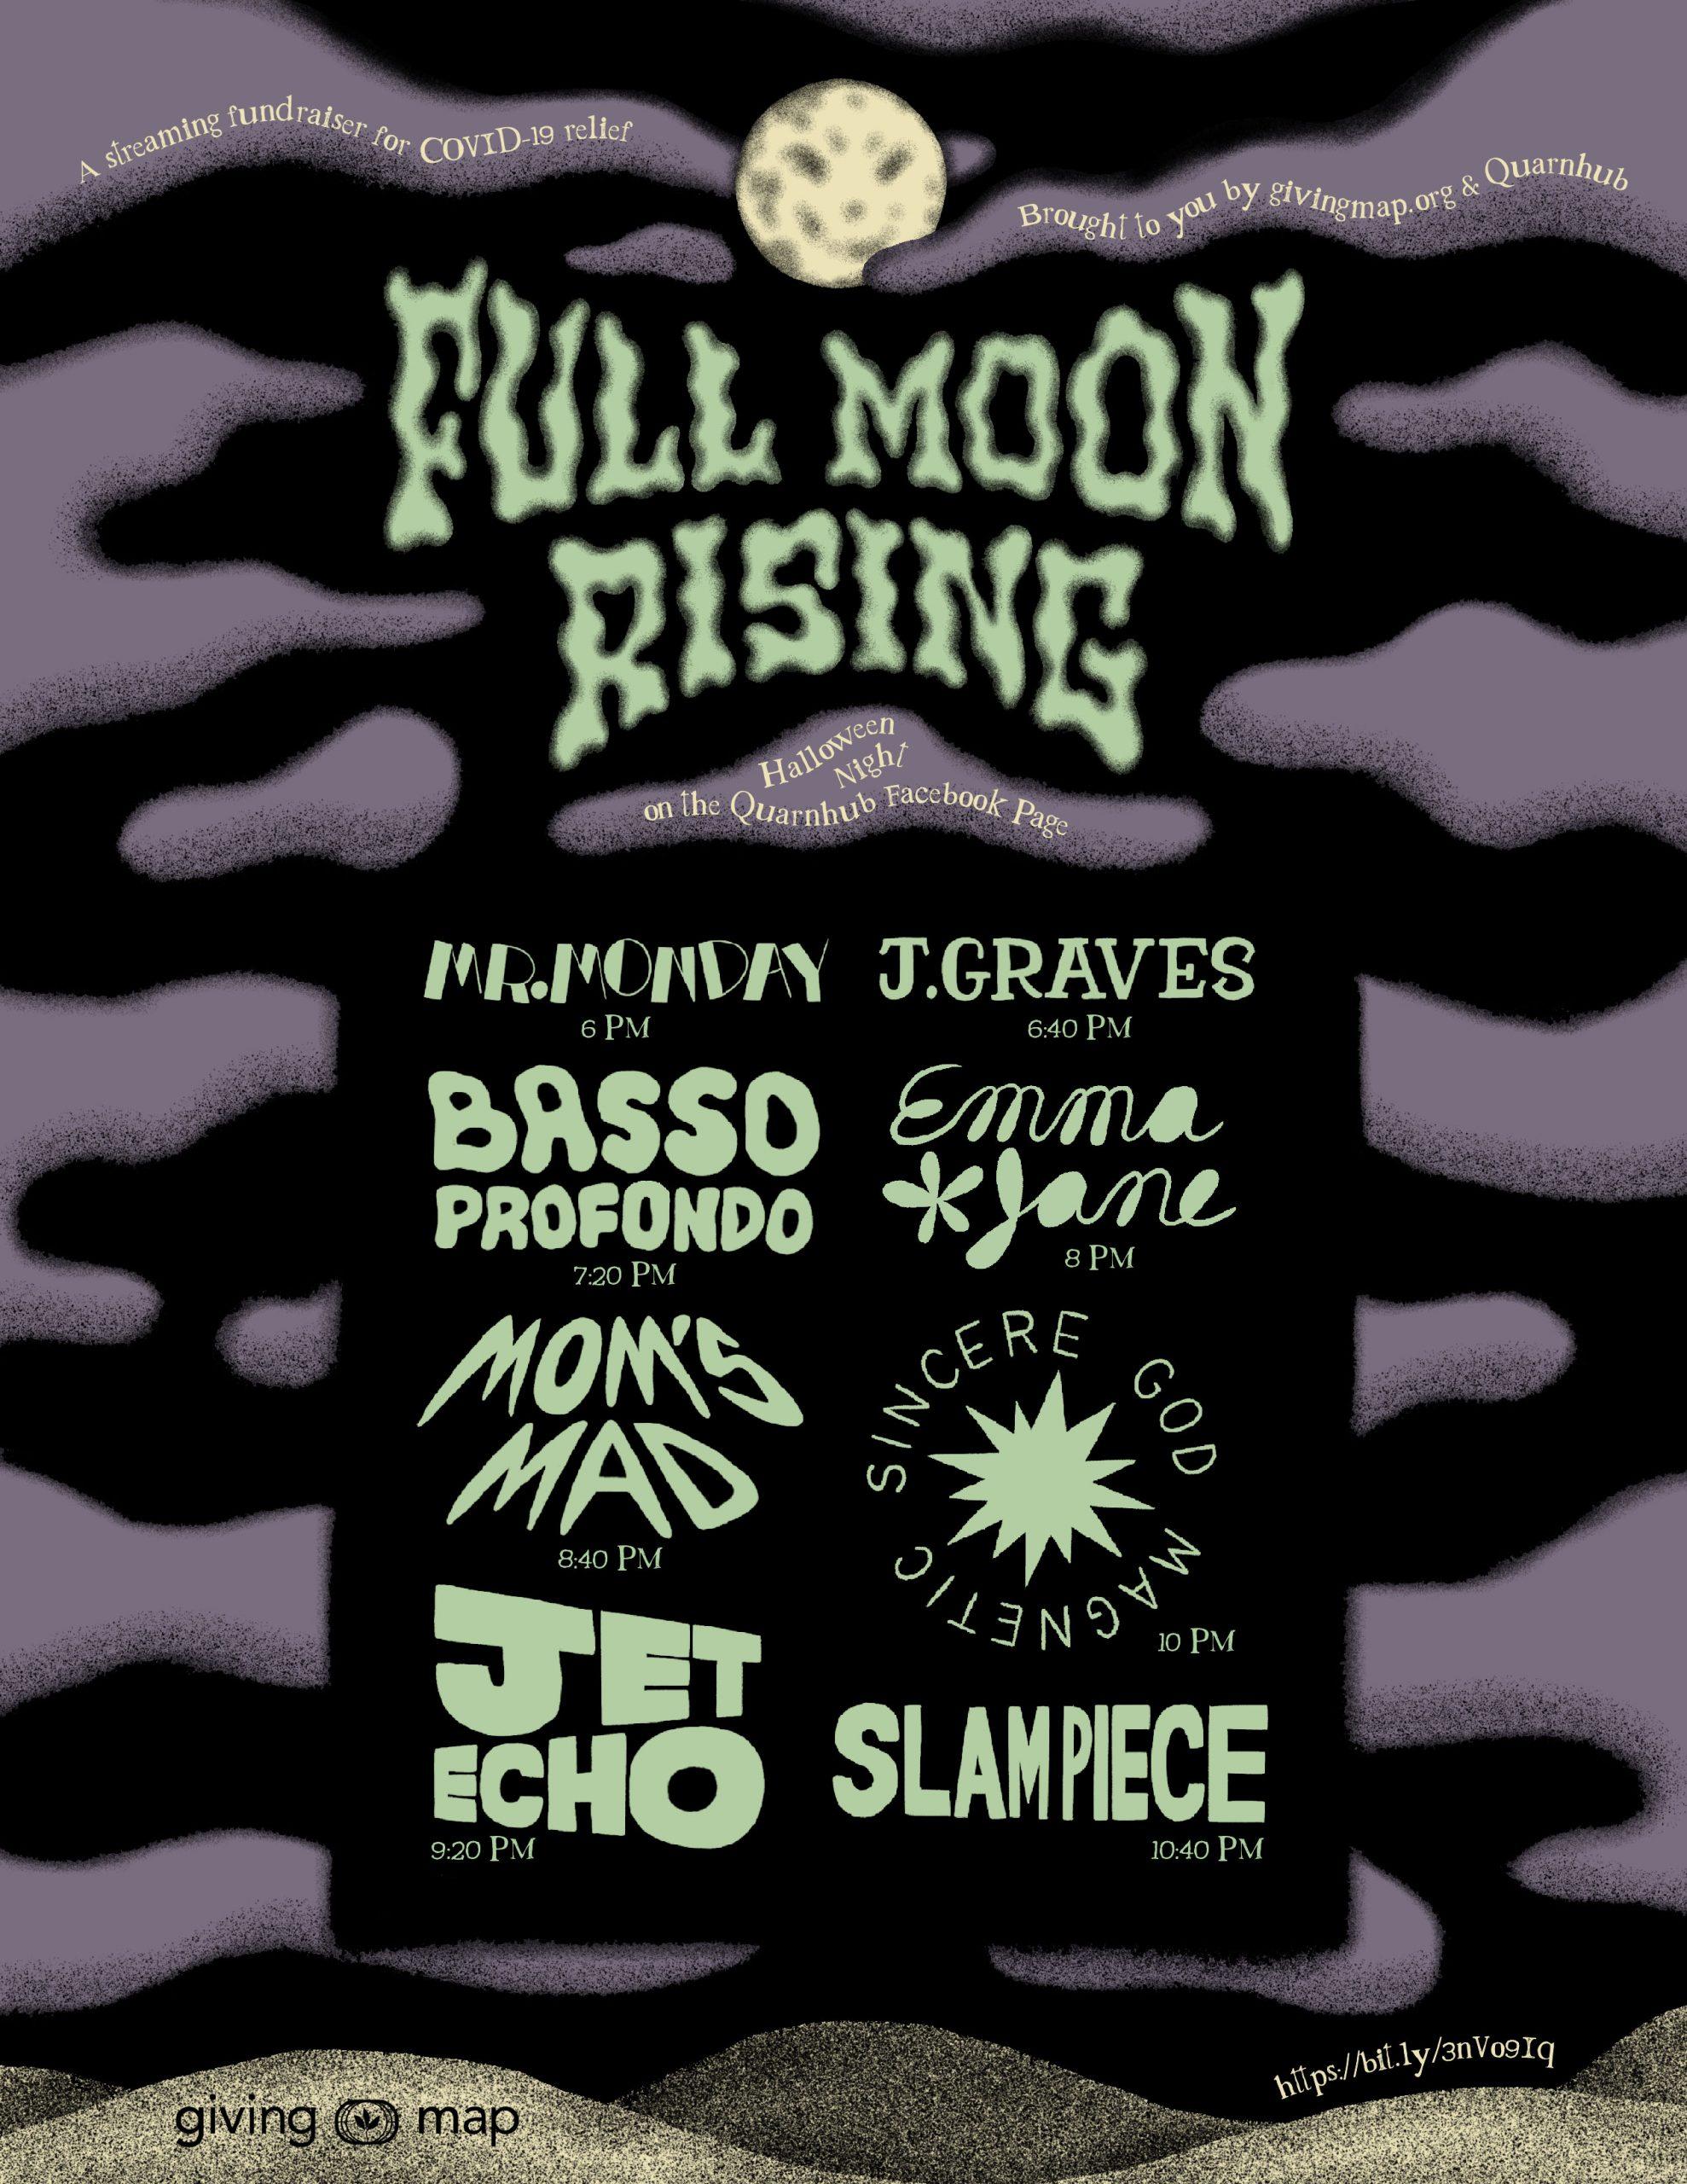 Full Moon Rising Halloween Benefit Poster